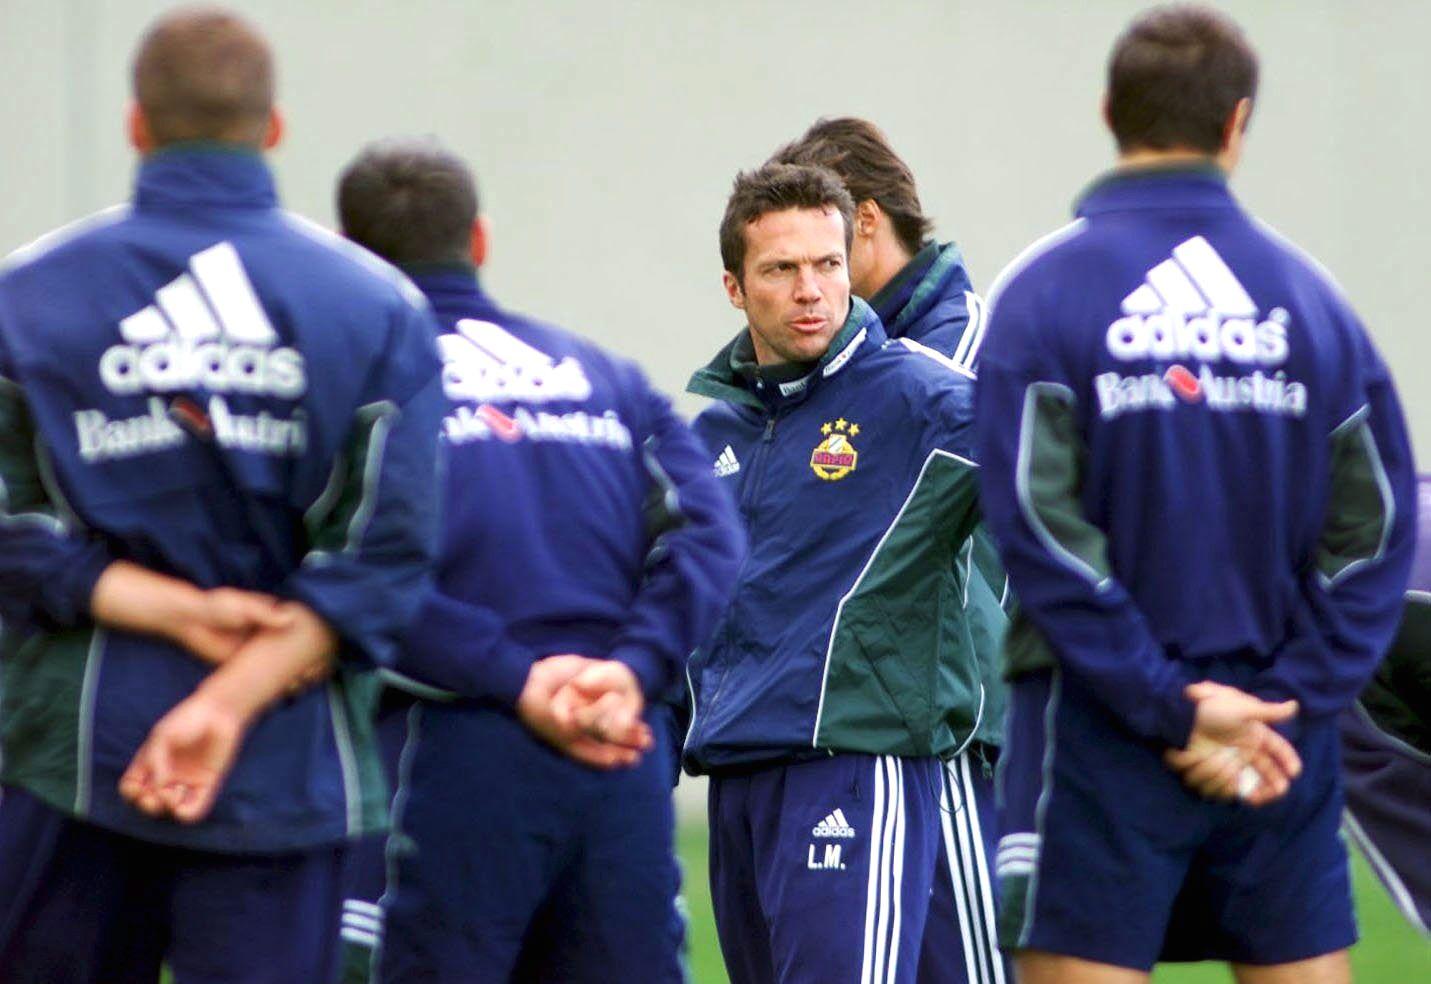 Lothar Matthäus/ Trainer Rapid Wien